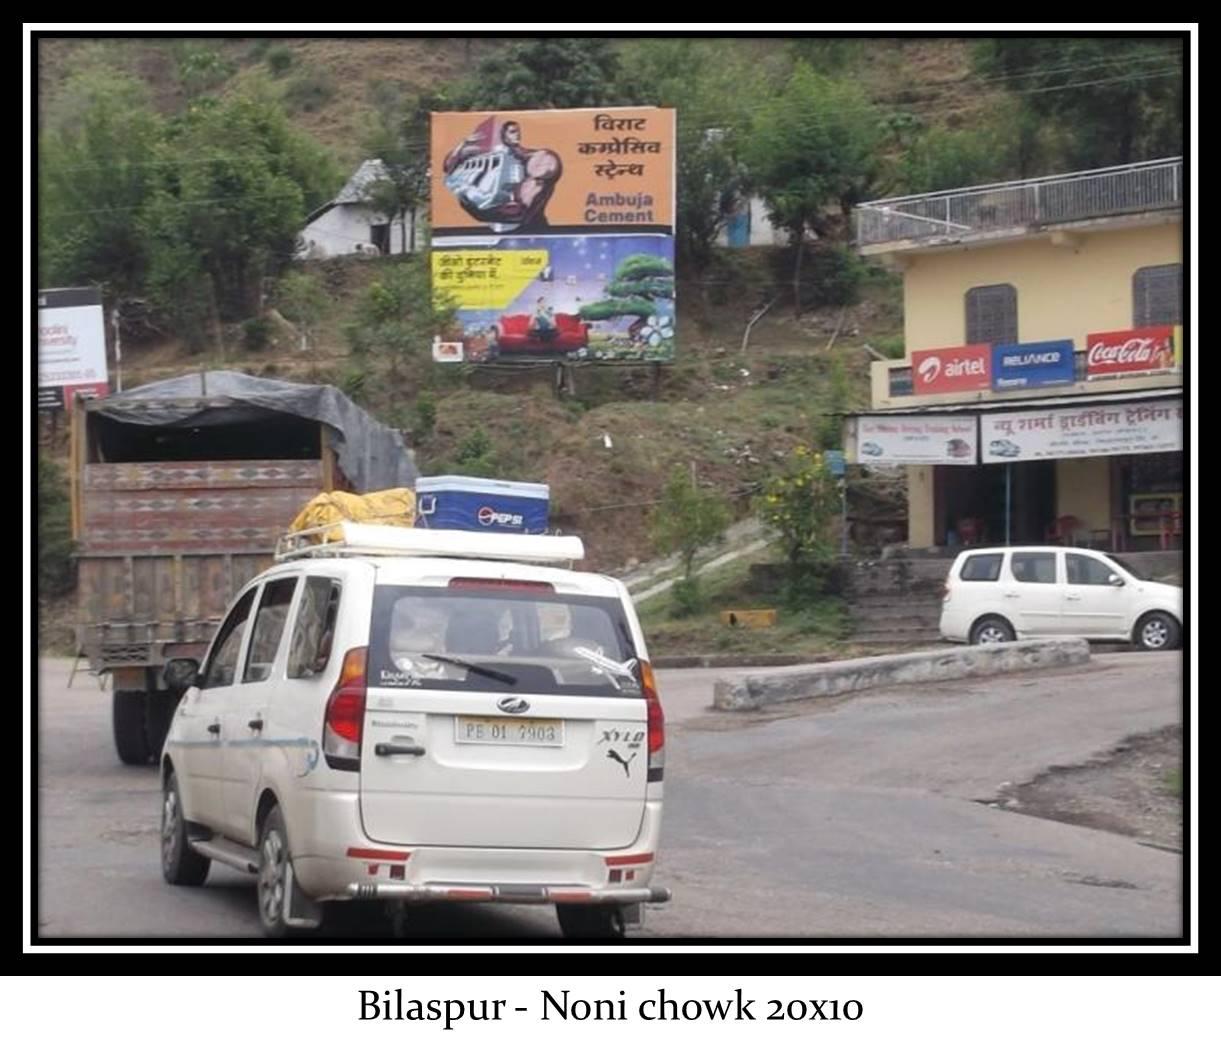 Noni Chowk, Bilaspur